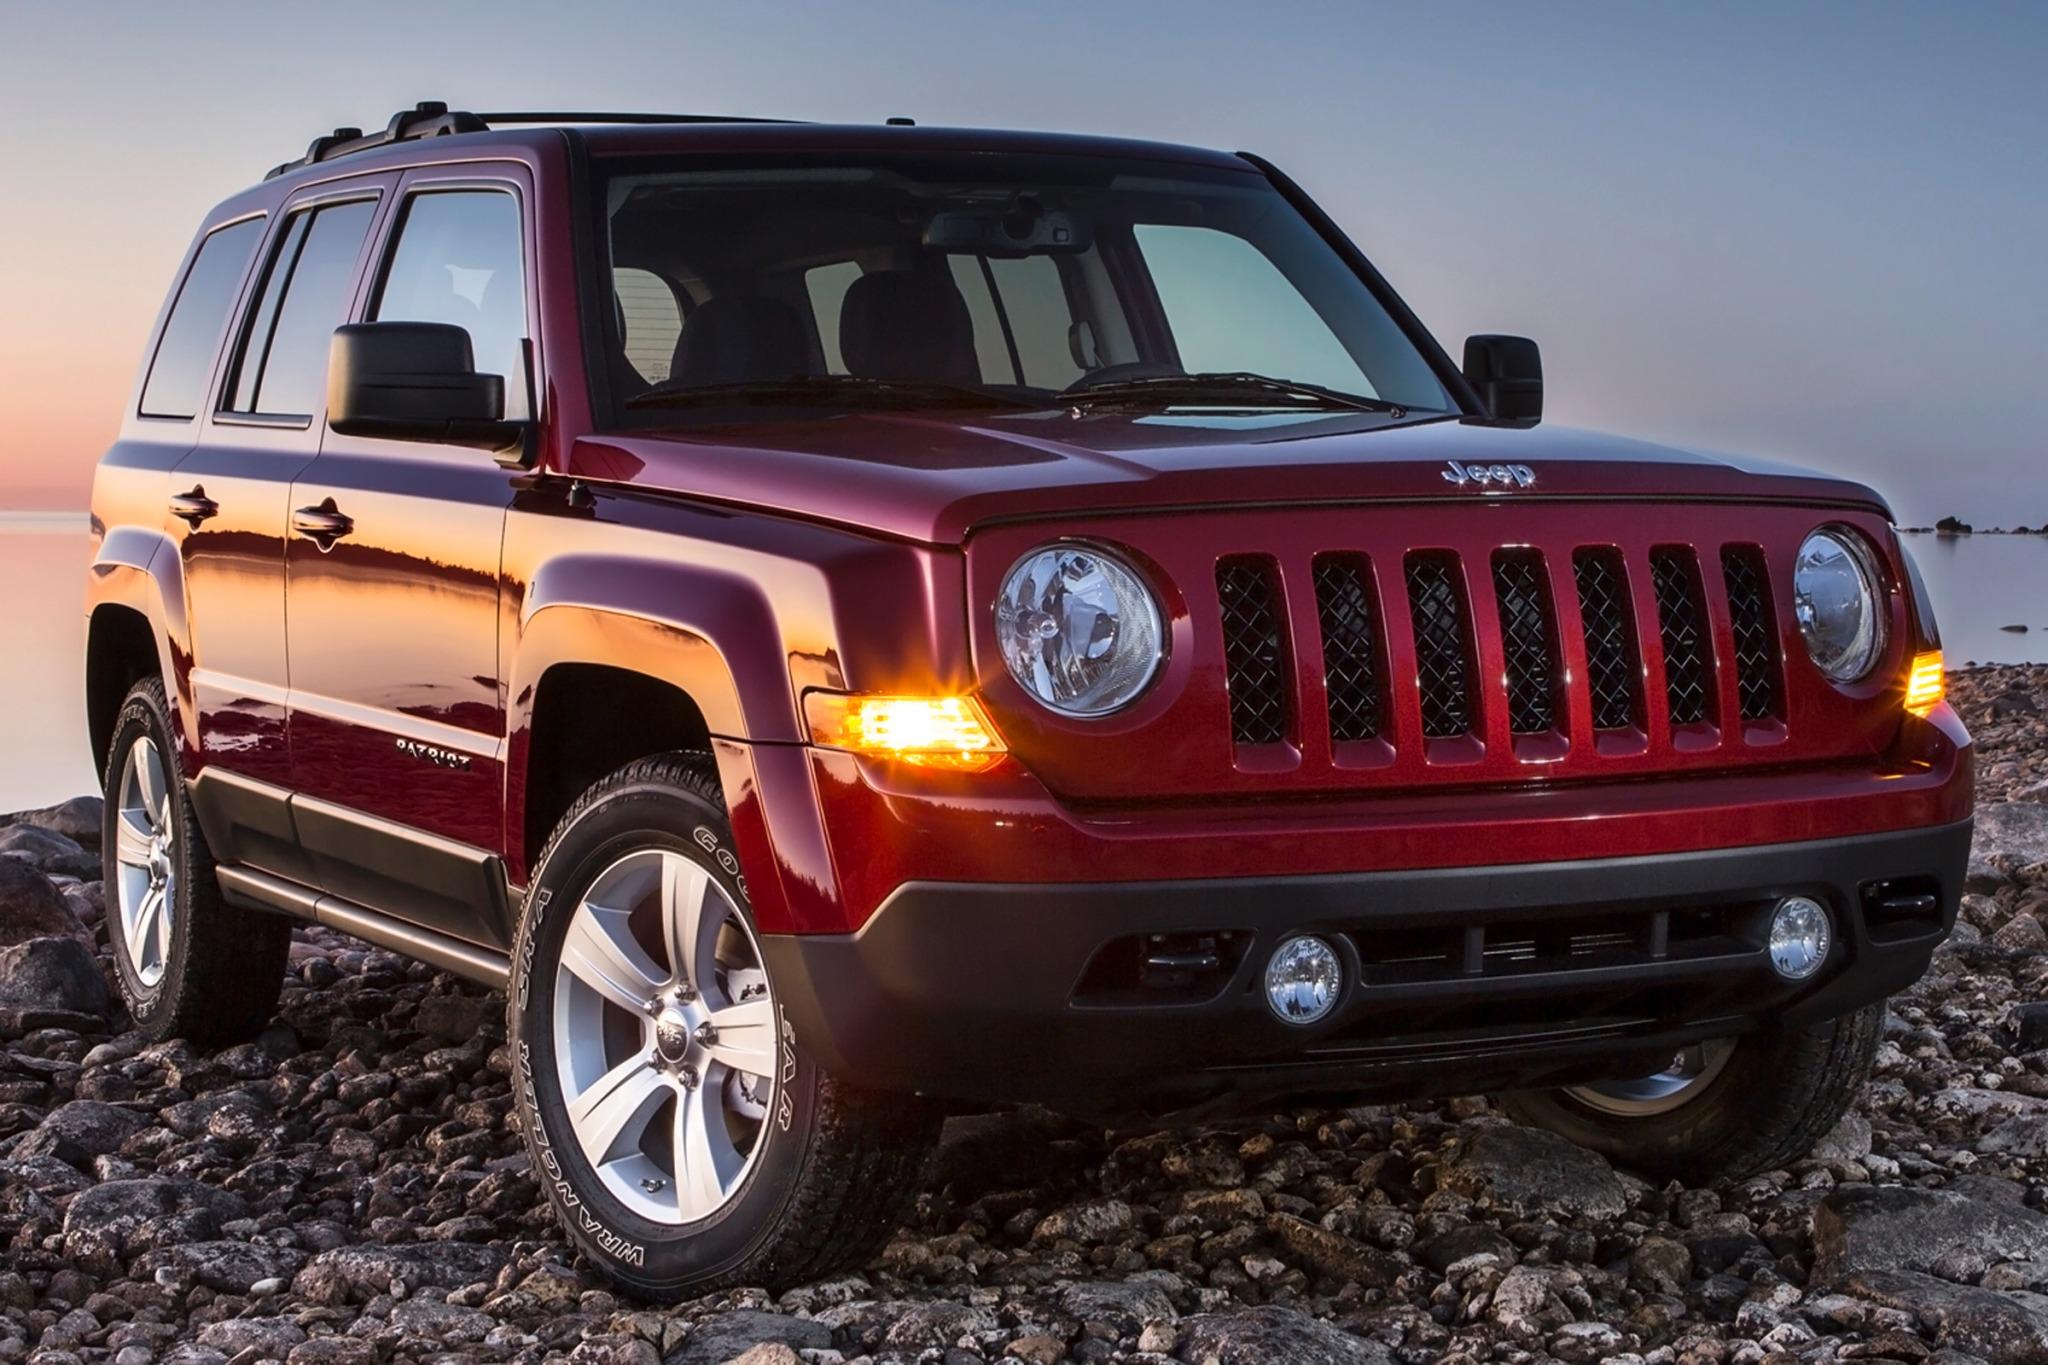 2016 jeep patriot 4dr suv latitude fq oem 1 2048